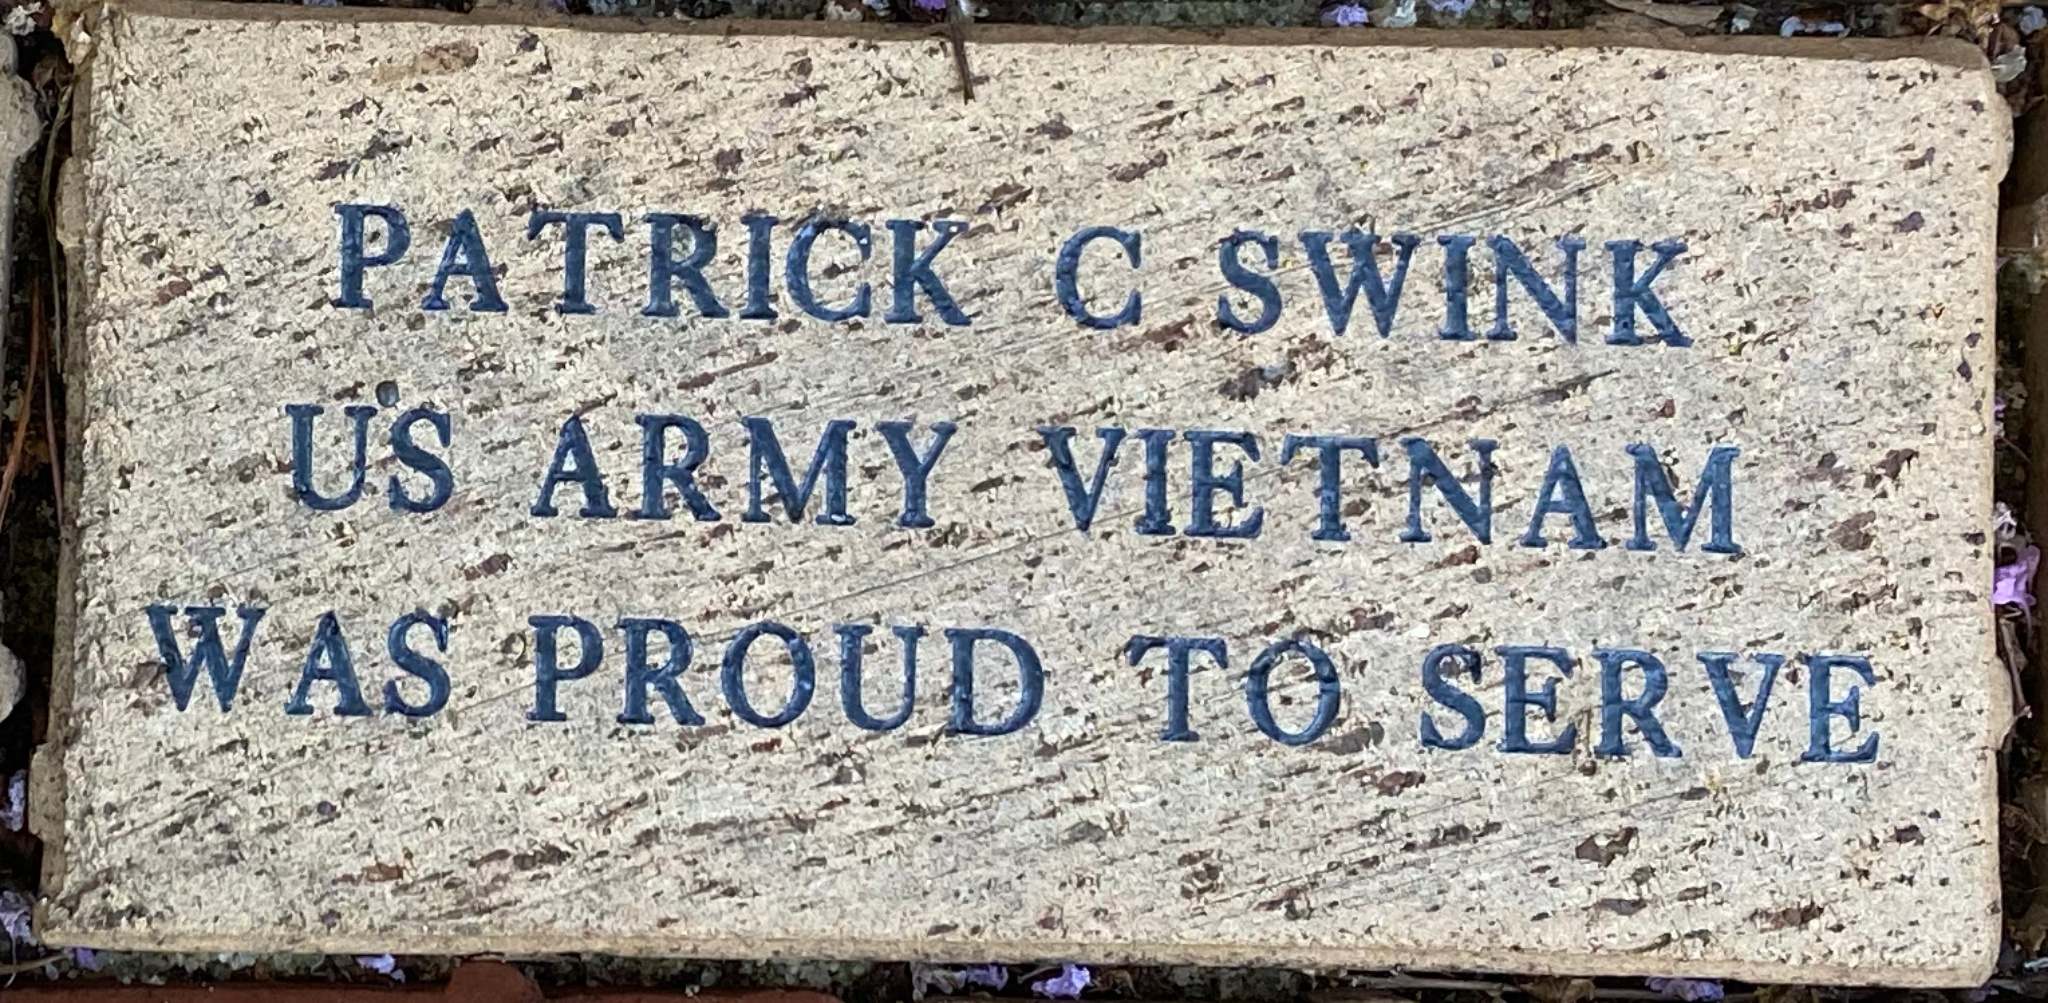 PATRICK C SWINK US ARMY VIETNAM WAS PROUD TO SERVE